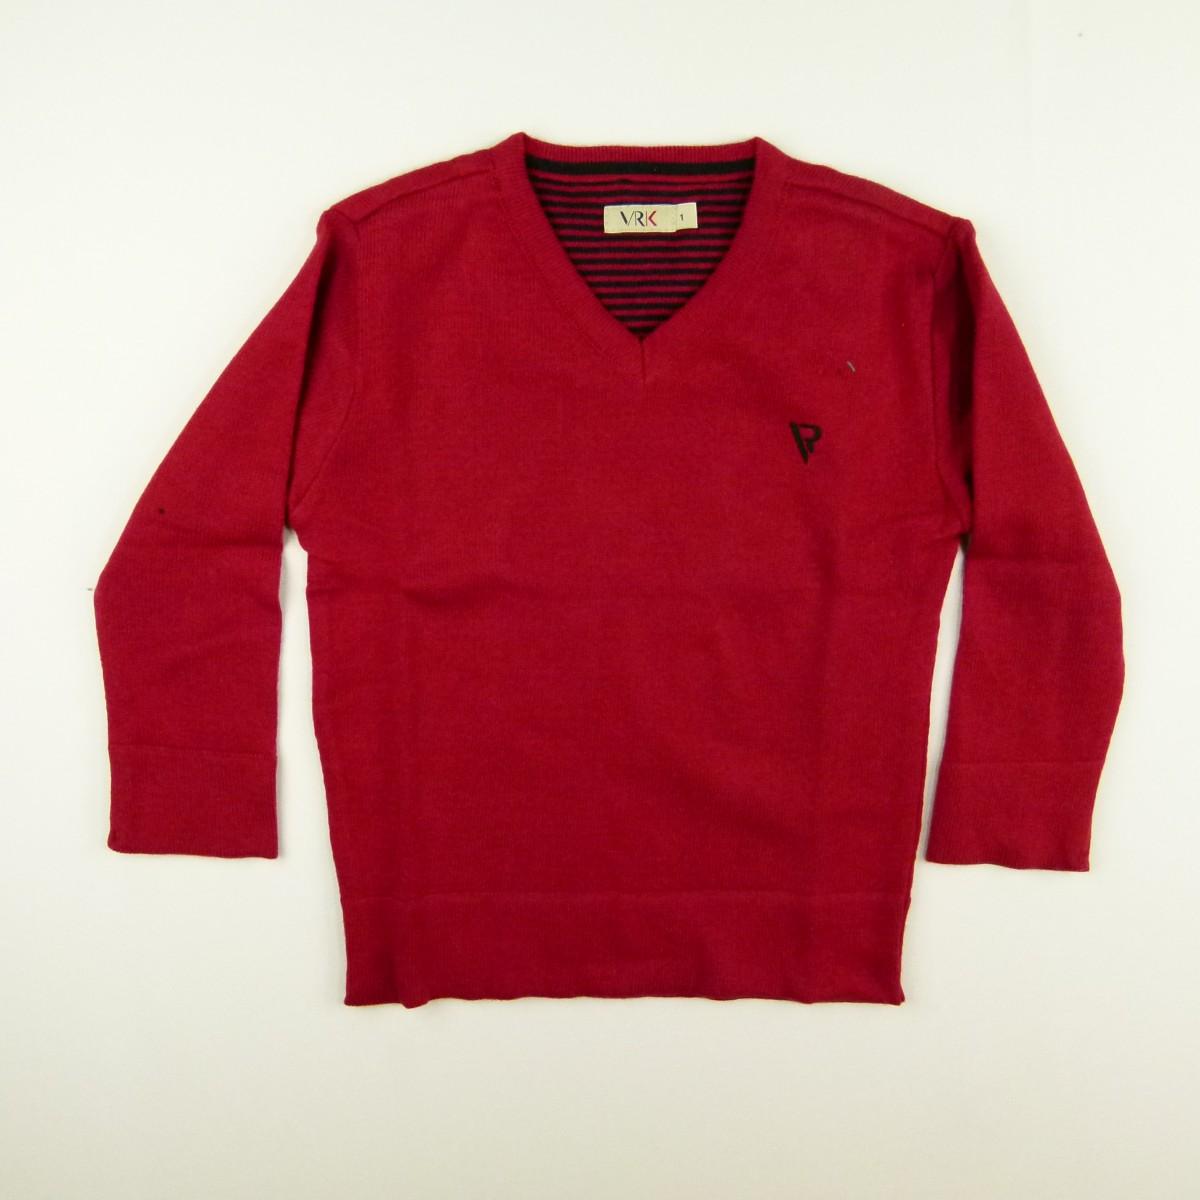 Sweter Gola V Básico VR - 031260 Vermelho  844291c1847